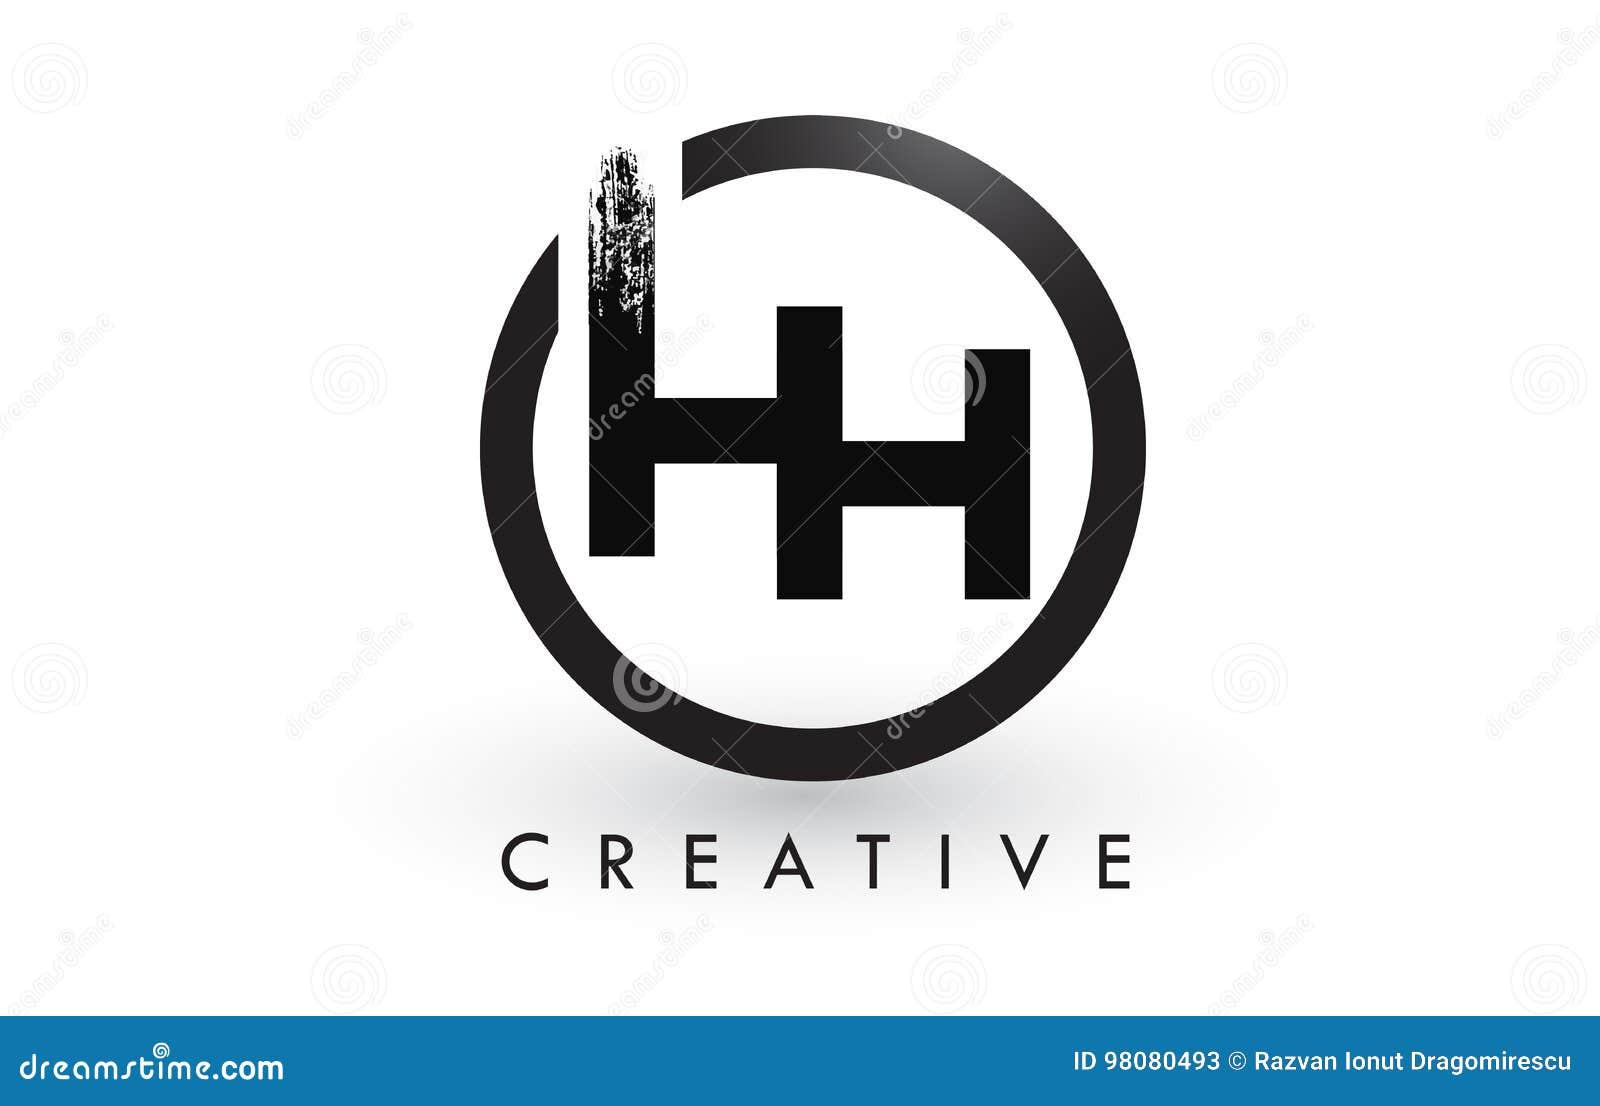 Hh Brush Letter Logo Design Creative Brushed Letters Icon Logo